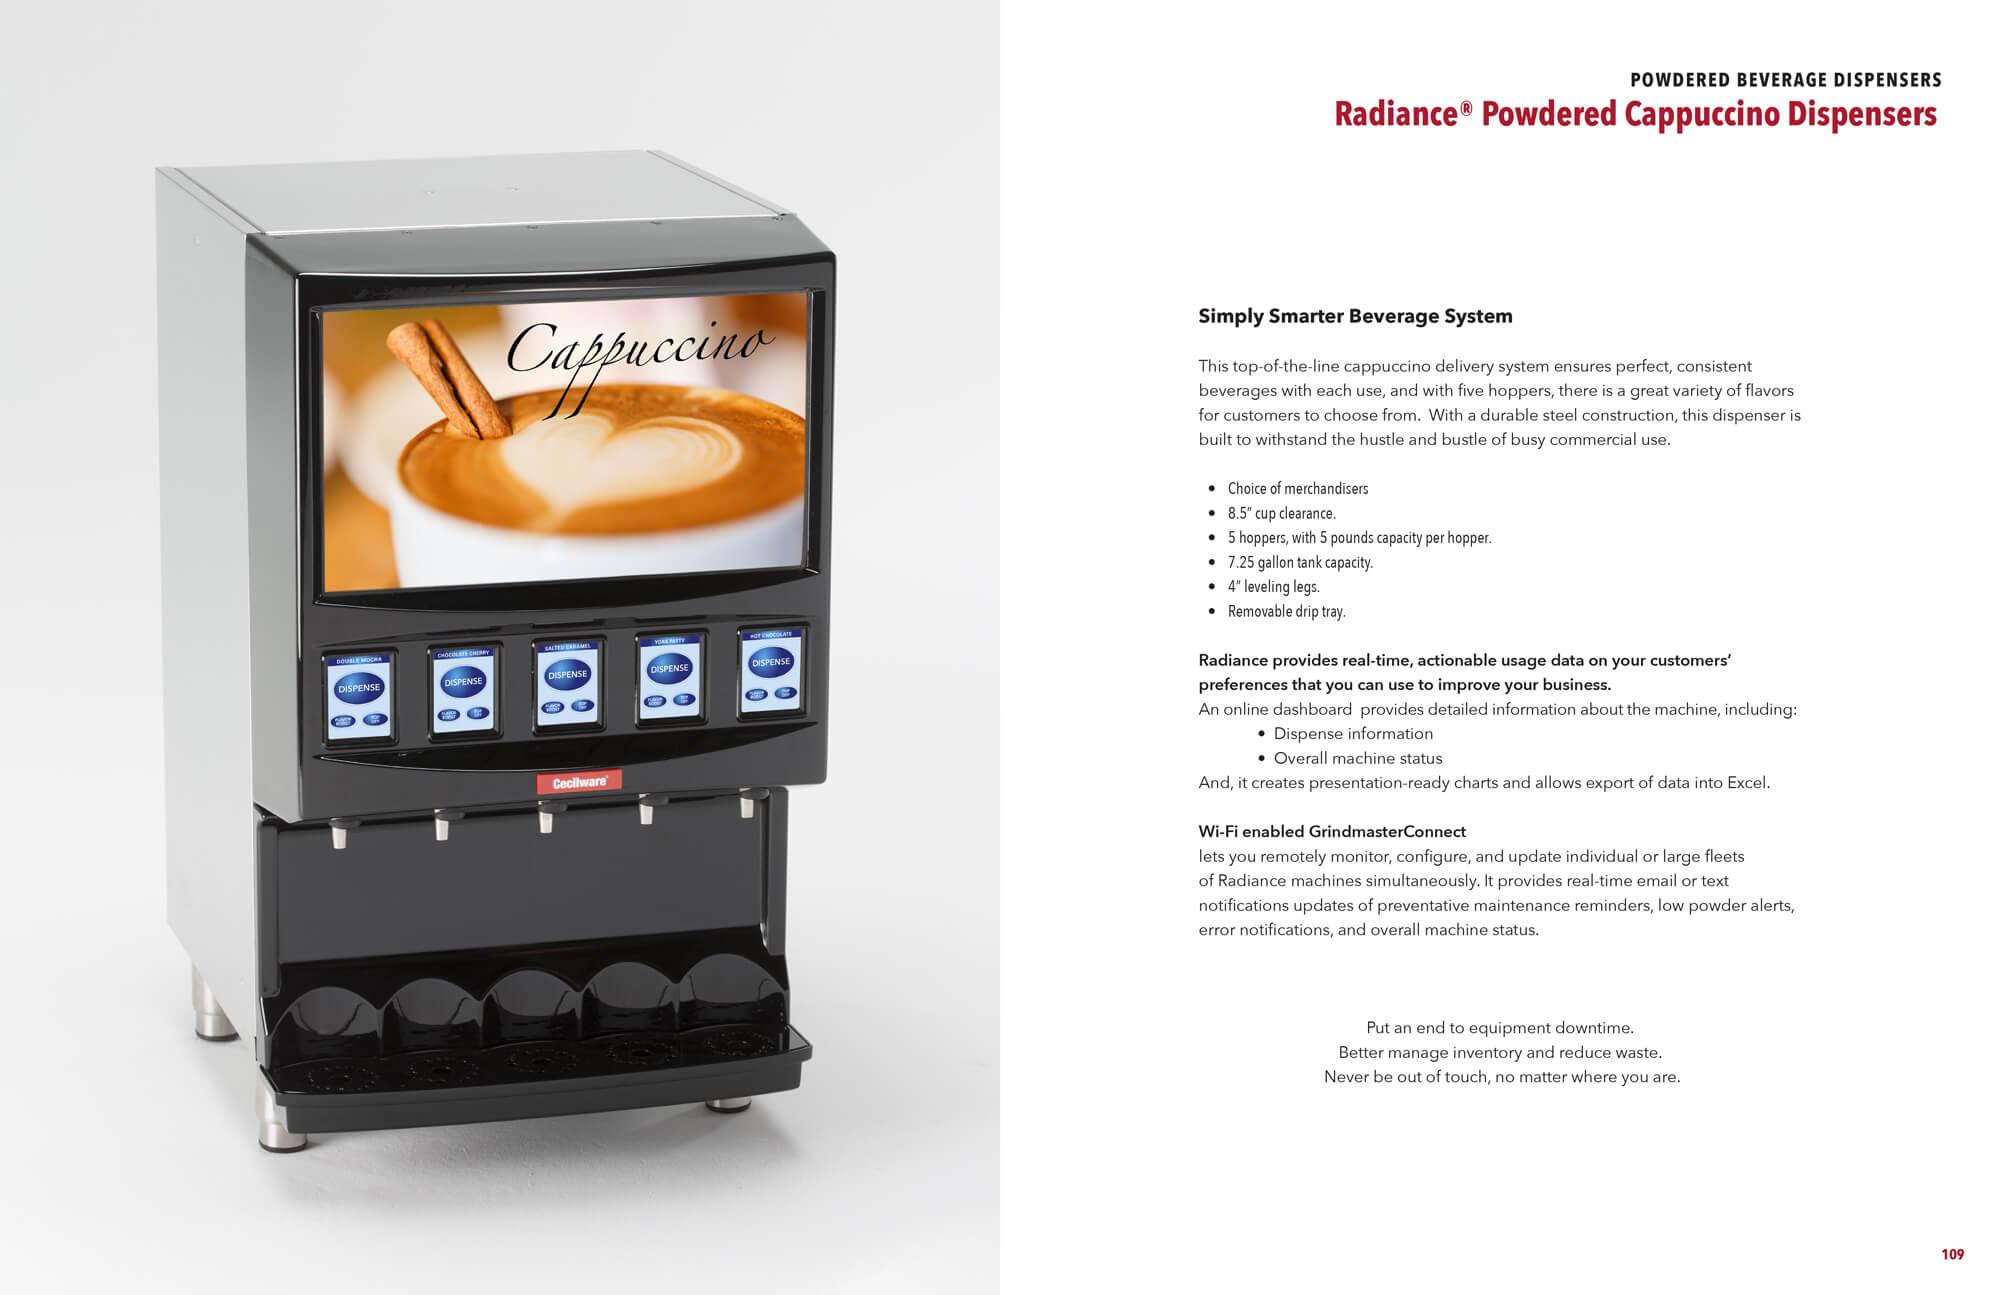 Grindmaster-Cecilware Product Catalog